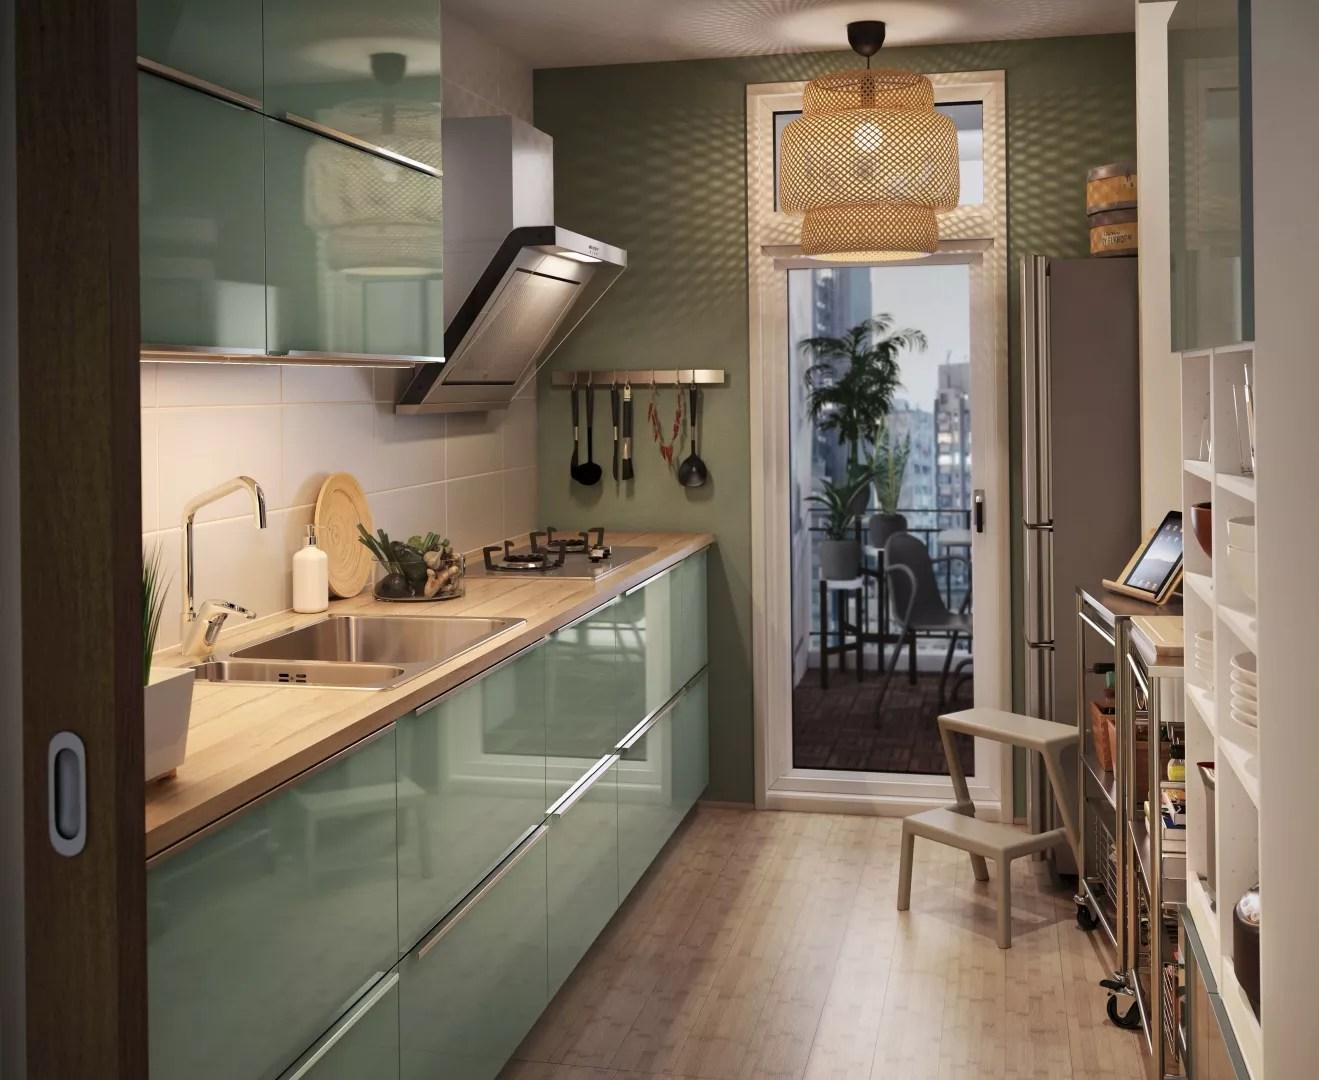 keuken wandtegels ikea : Wandtegels Ikea Fabulous Classickche Kche Einbaukche Eckkche Kche